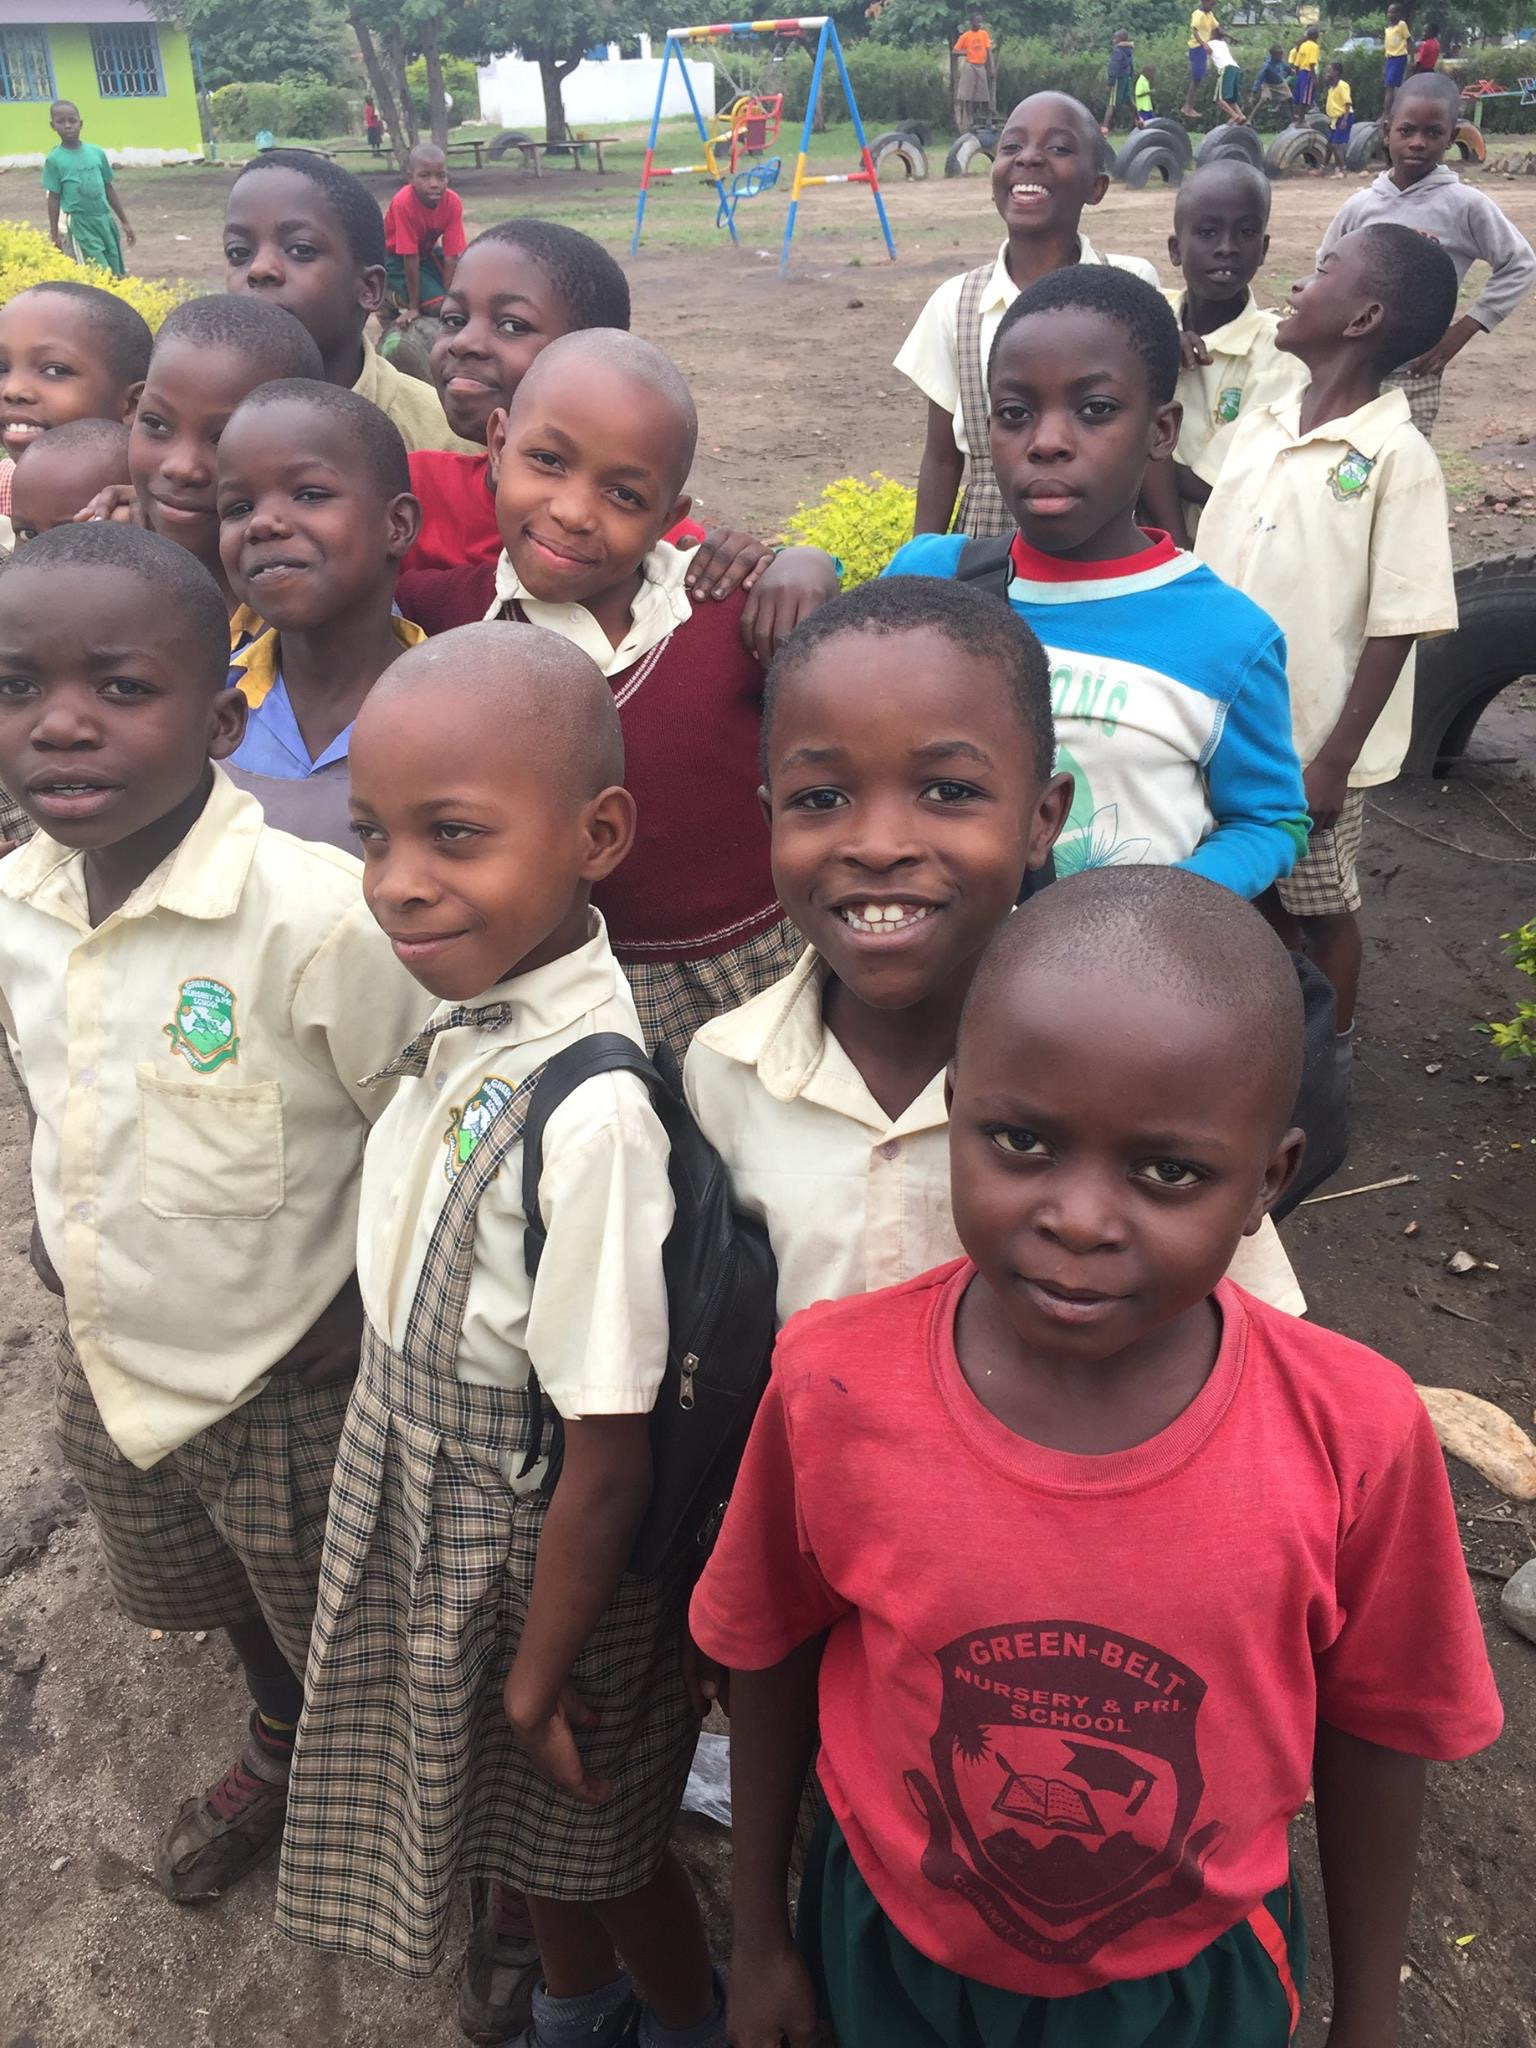 group of Ugandan children at school